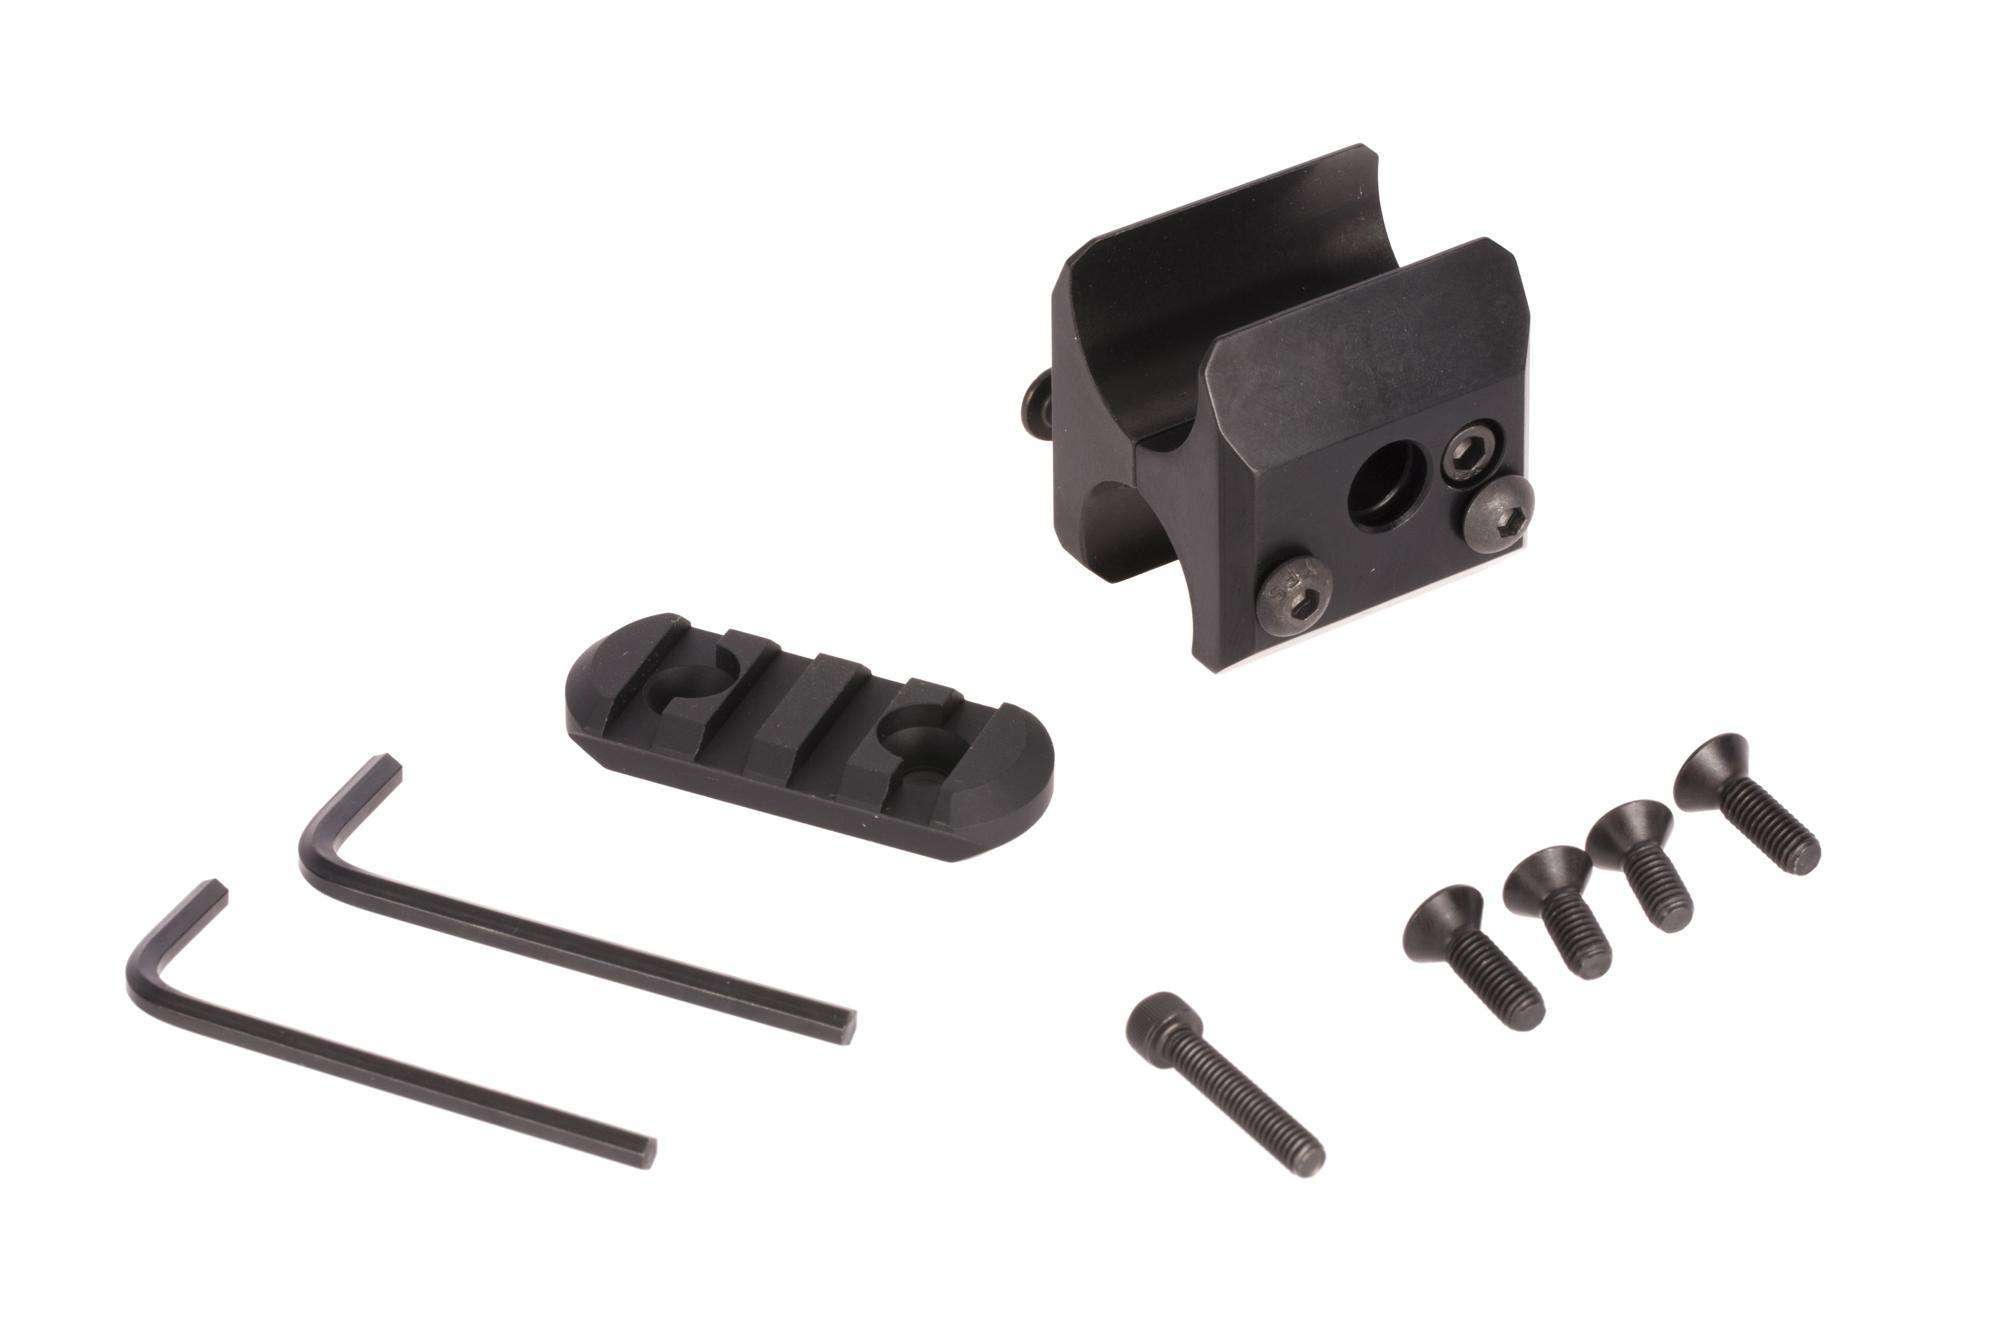 Mesa Tactical Magazine Clamp with Rail - Remington 870/Mossberg 930 - 12 ga